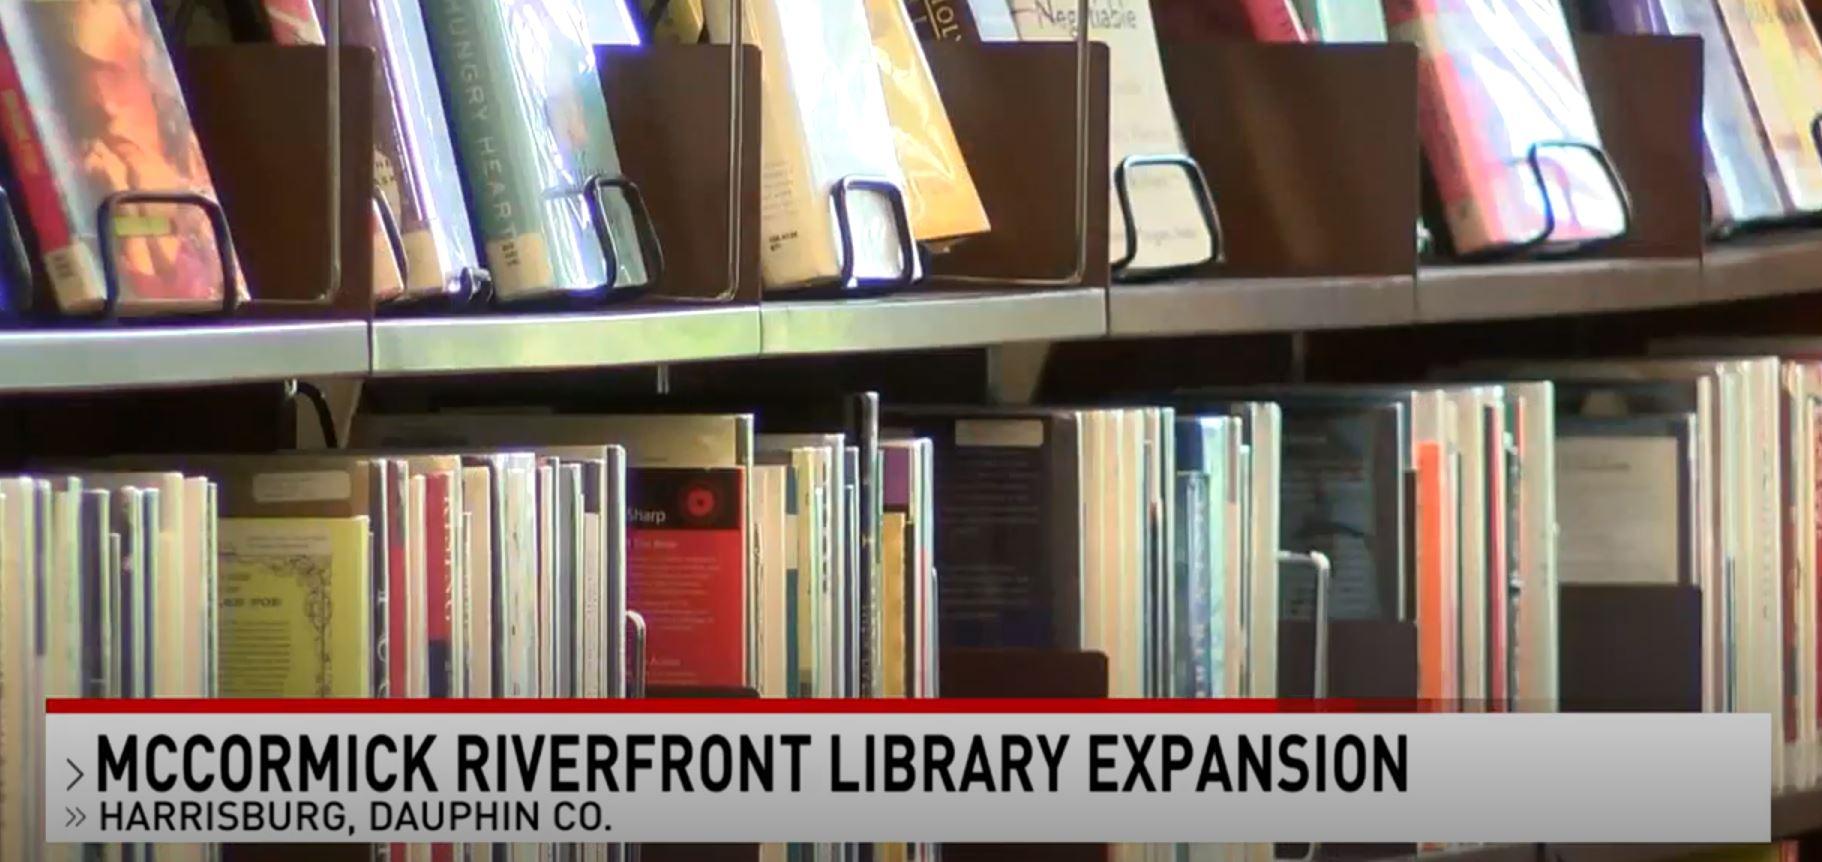 McCormick Riverfront Library